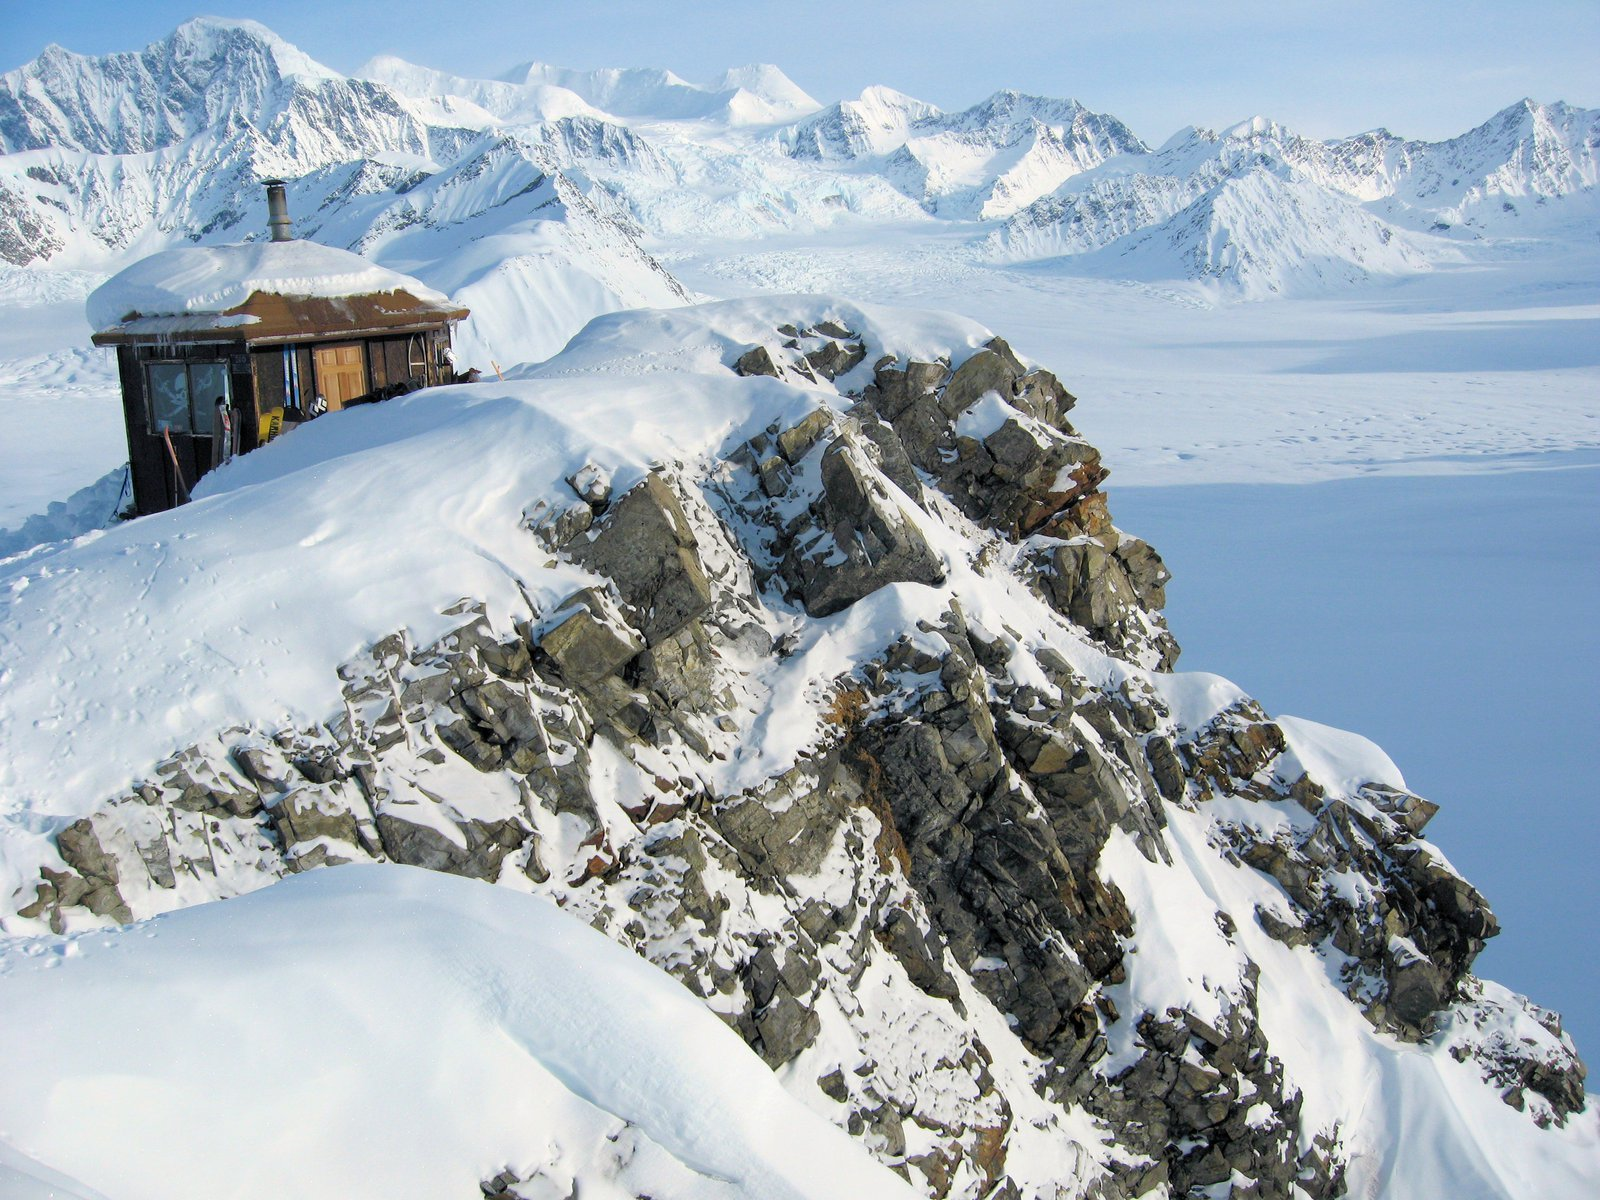 Don Sheldon Mountain Hut